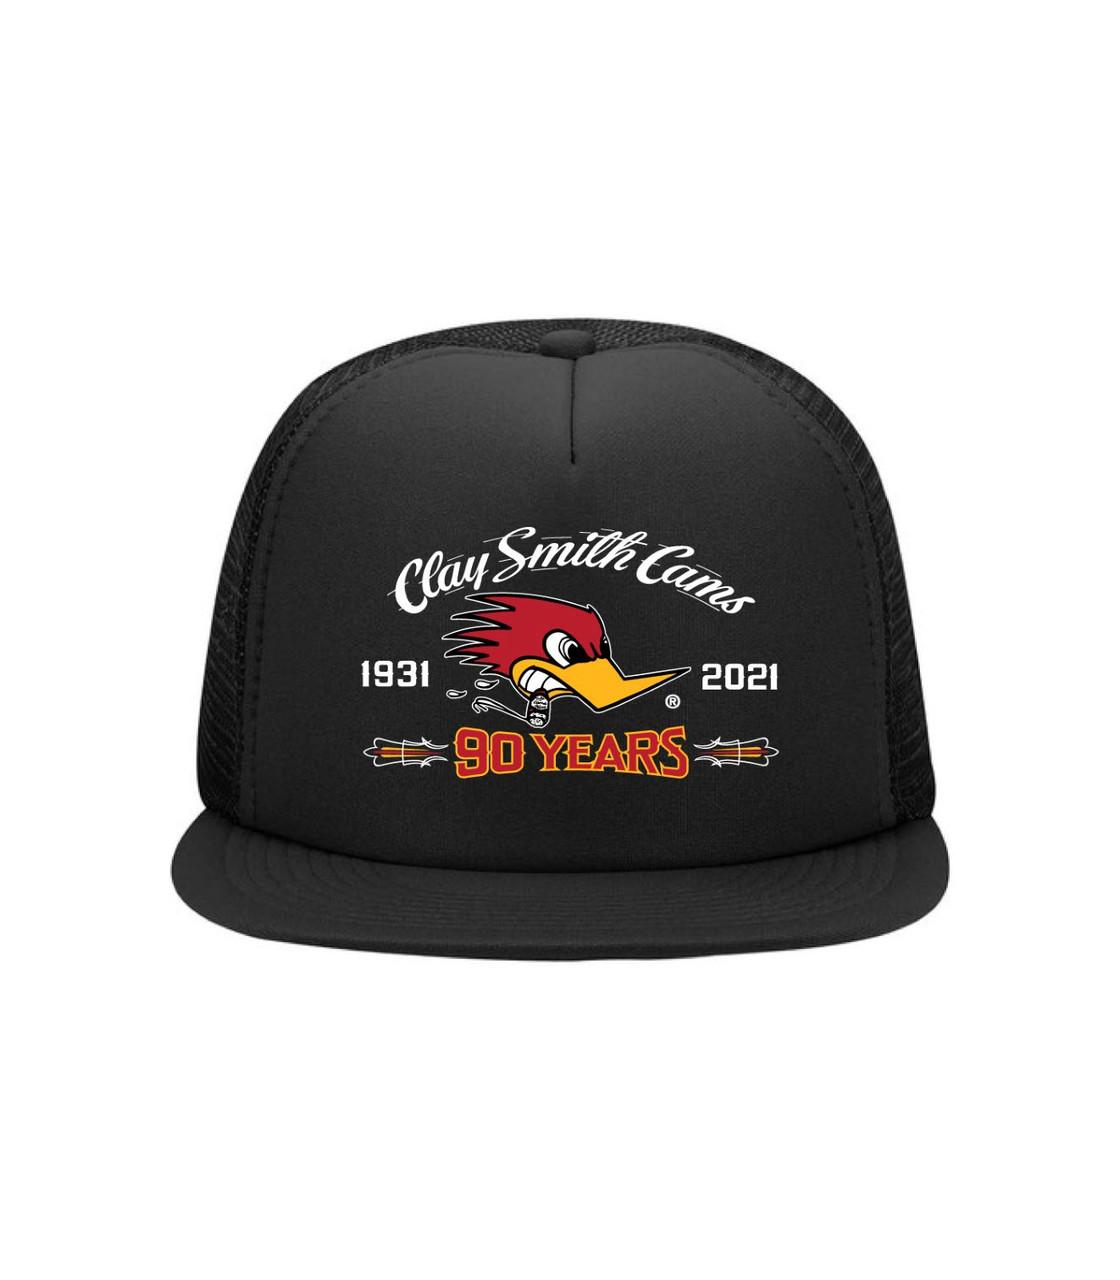 Clay Smith 90th Celebration Foam Trucker Hat